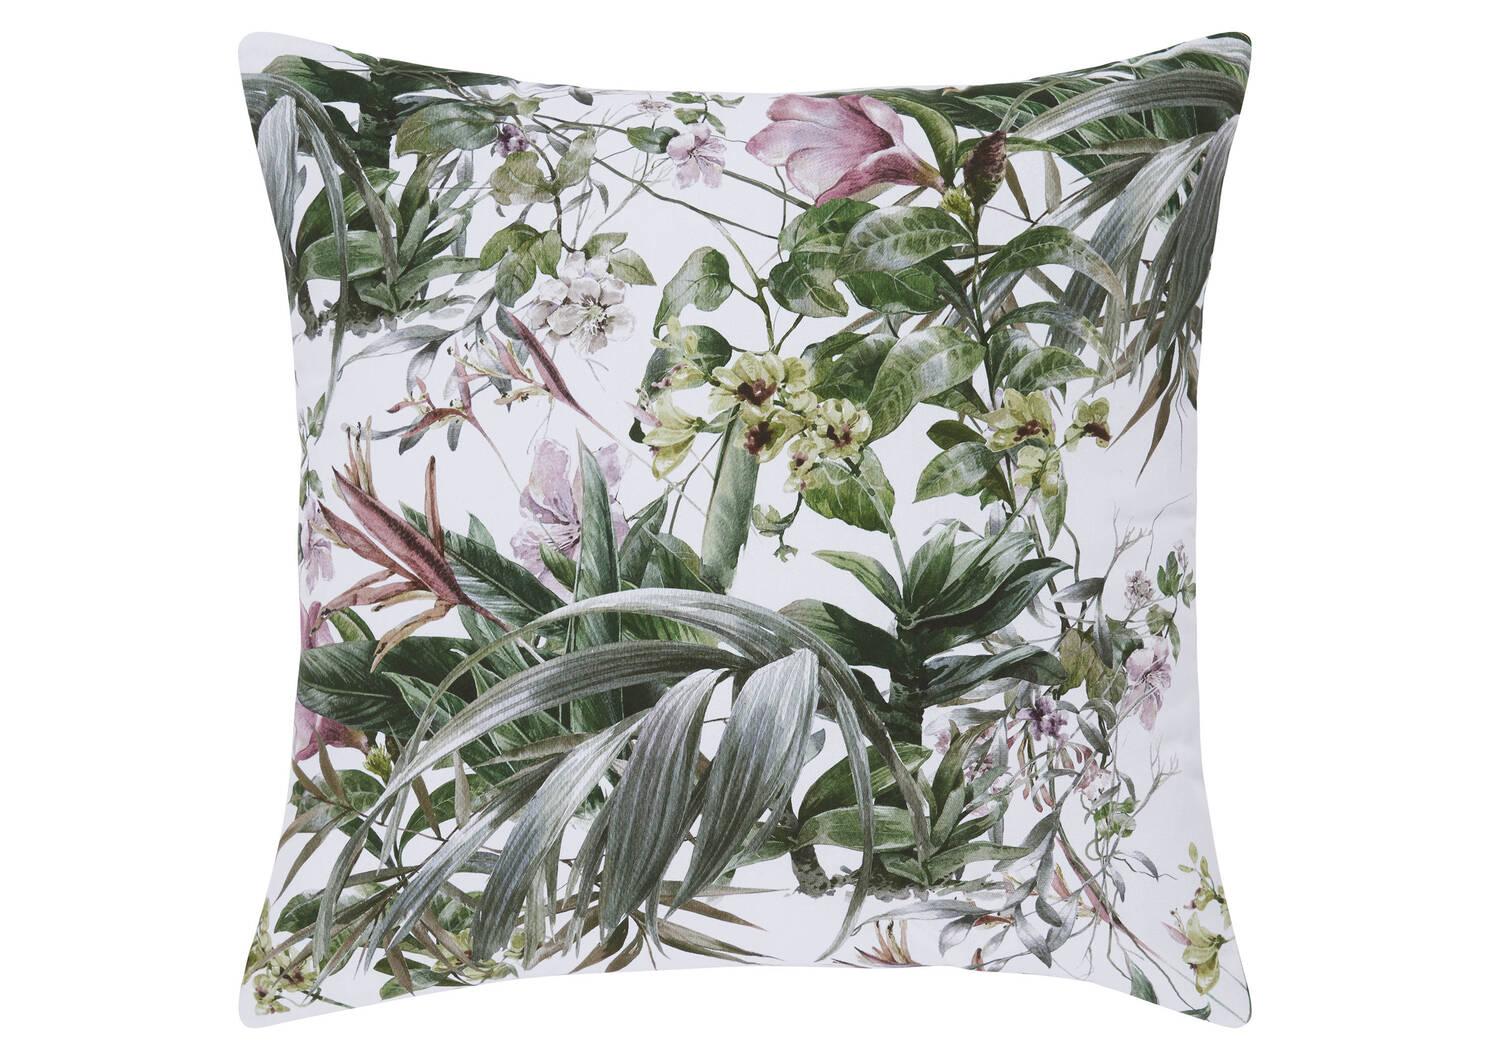 Spirited Floral Toss 20x20 Wht/Sage/P